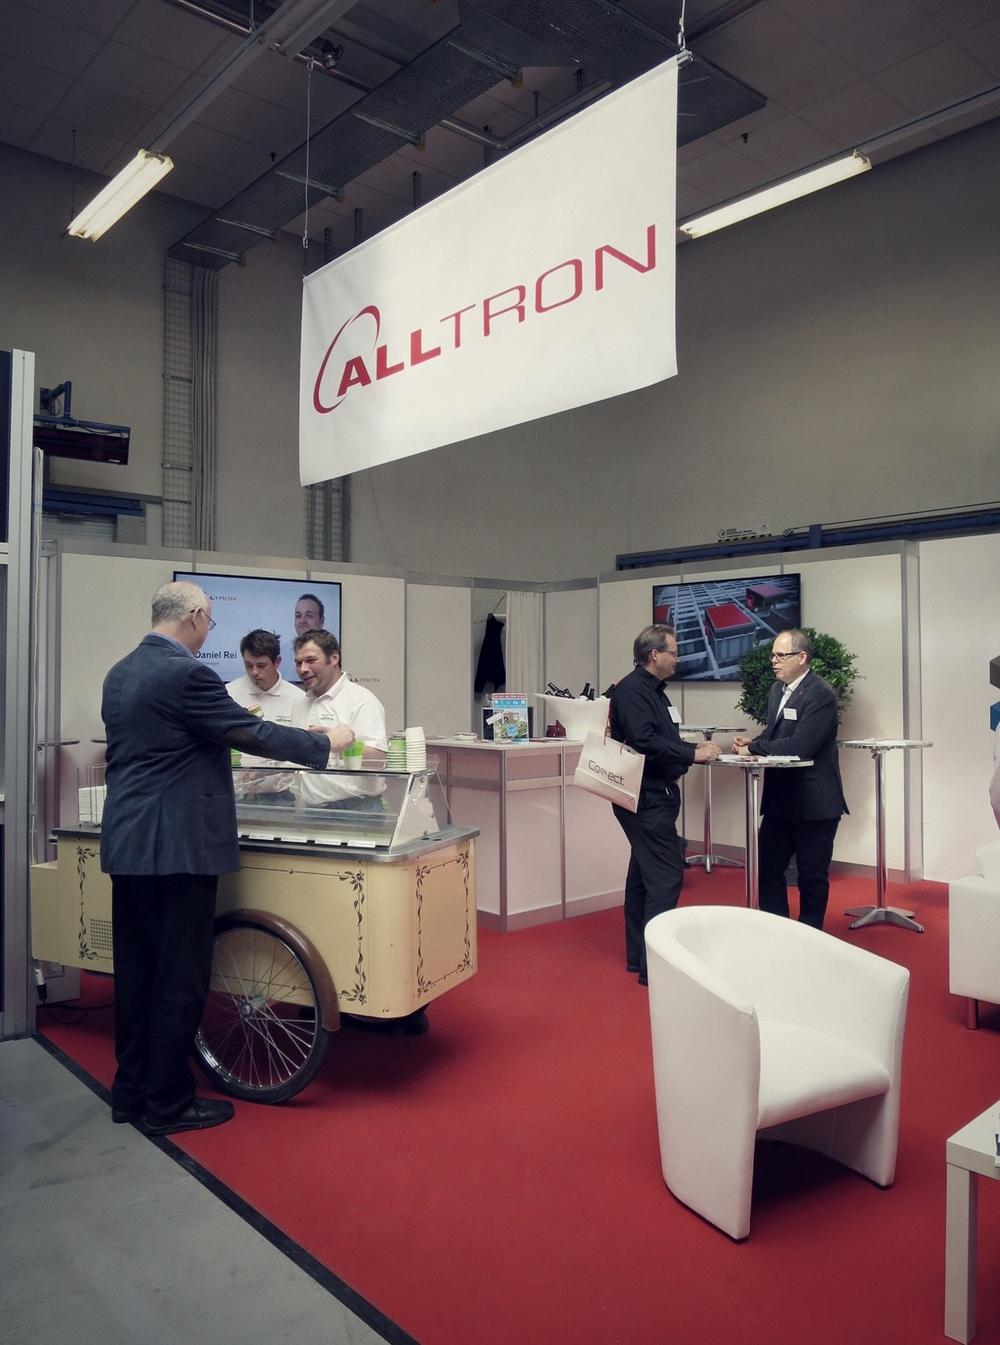 PENGland AG_Referenz_Competec Hausmesse Brack & Alltron (8).JPG